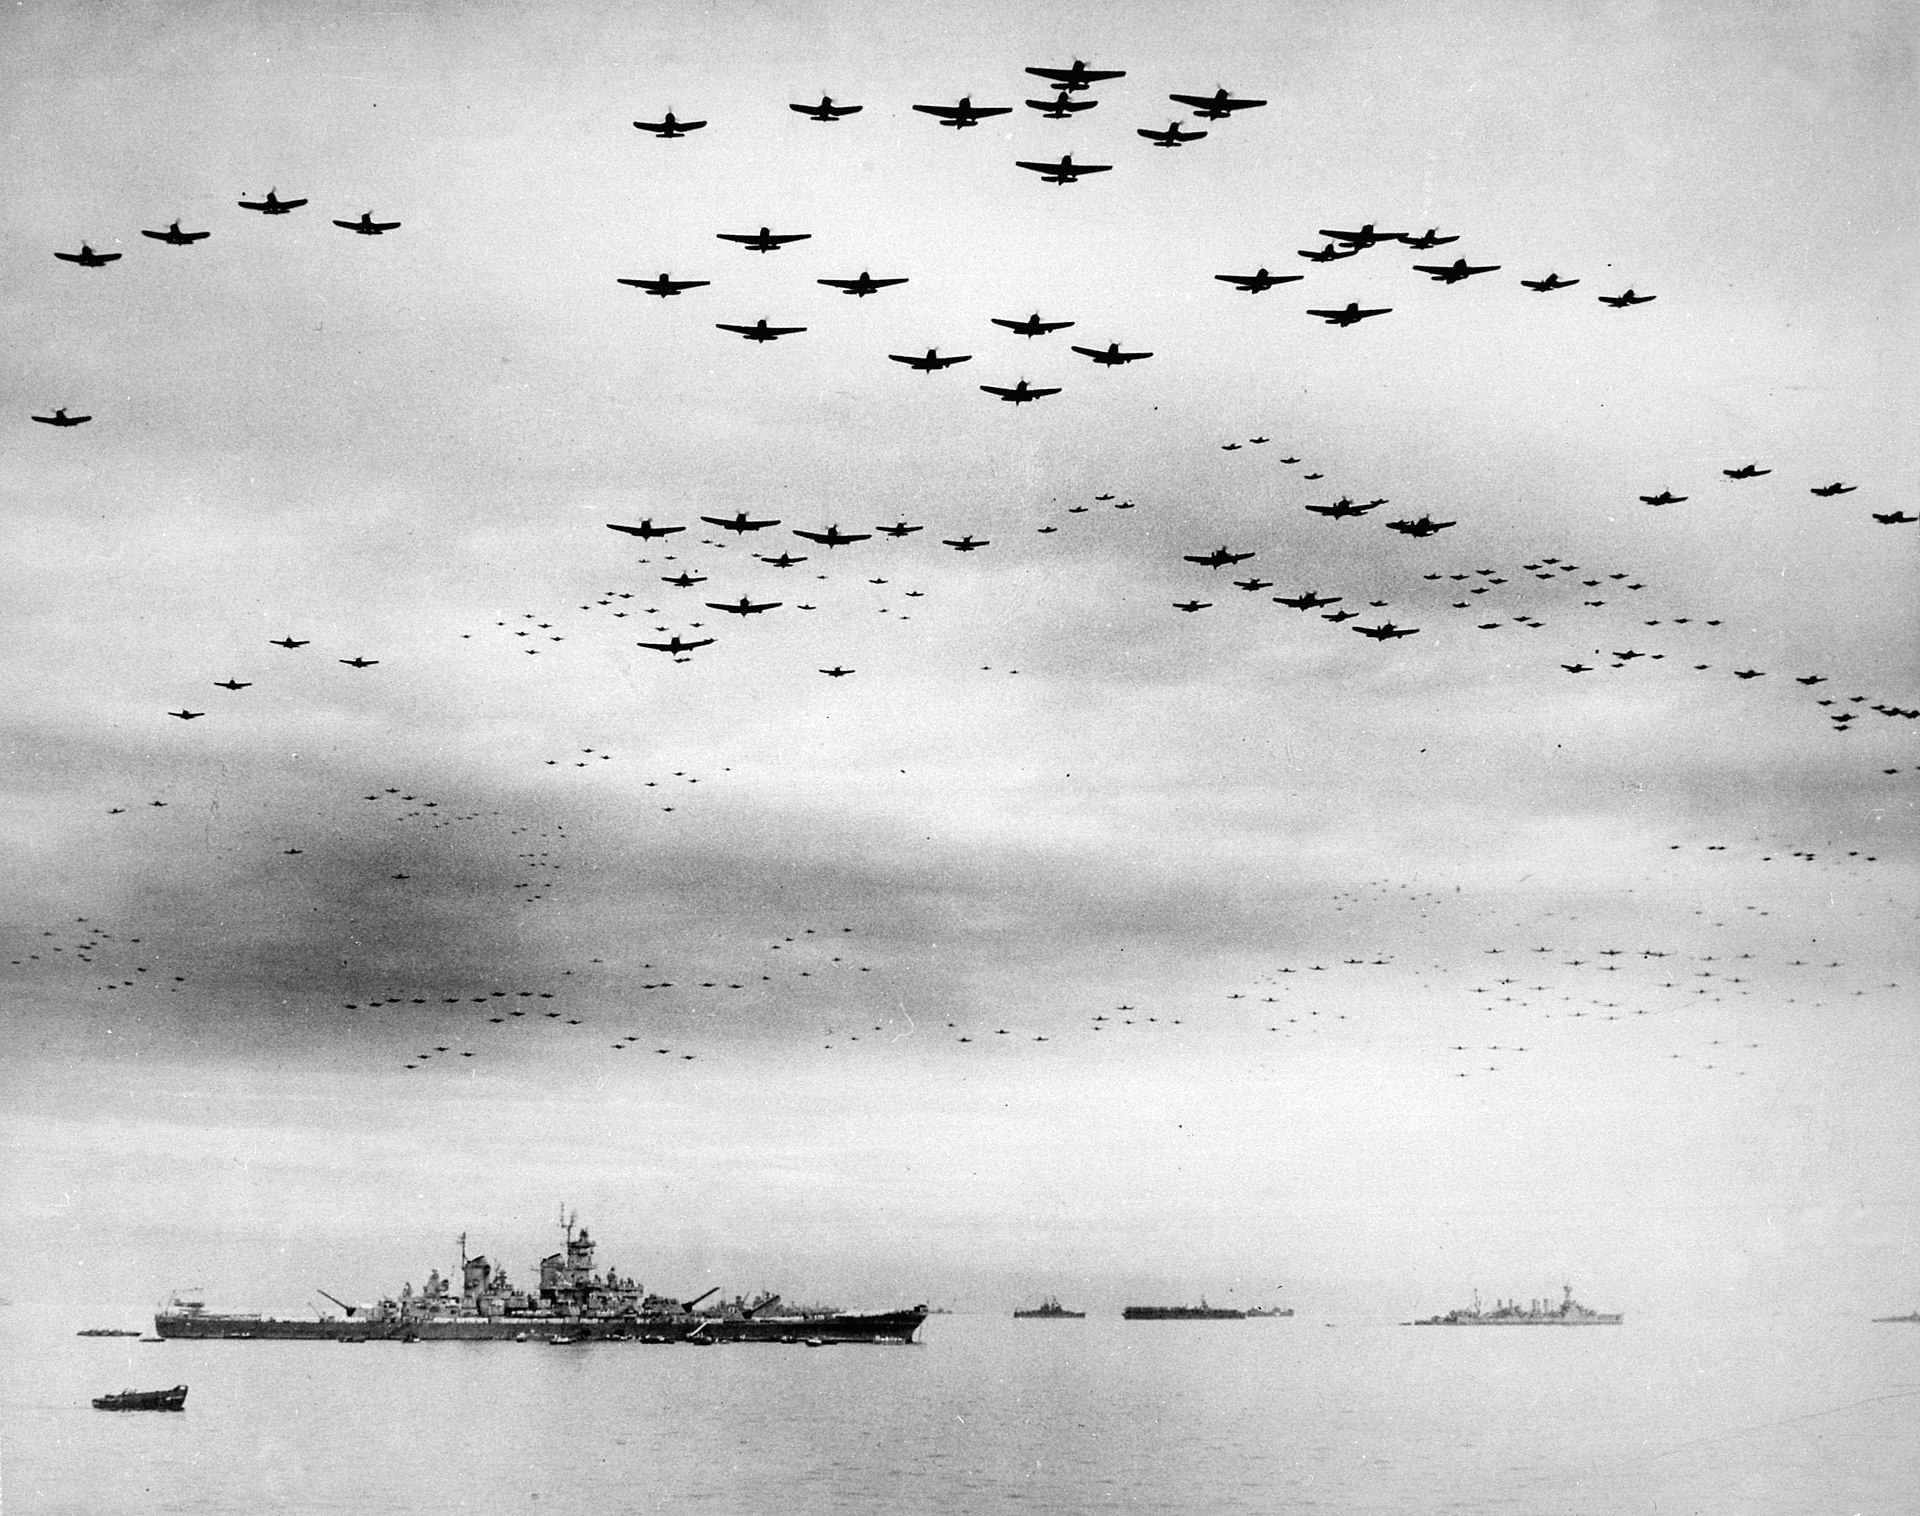 https://upload.wikimedia.org/wikipedia/commons/thumb/f/fa/USS_Missouri_%28BB-63%29_flyover%2C_Tokyo_Bay%2C_2_September_1945_%28520775%29.jpg/1920px-USS_Missouri_%28BB-63%29_flyover%2C_Tokyo_Bay%2C_2_September_1945_%28520775%29.jpg